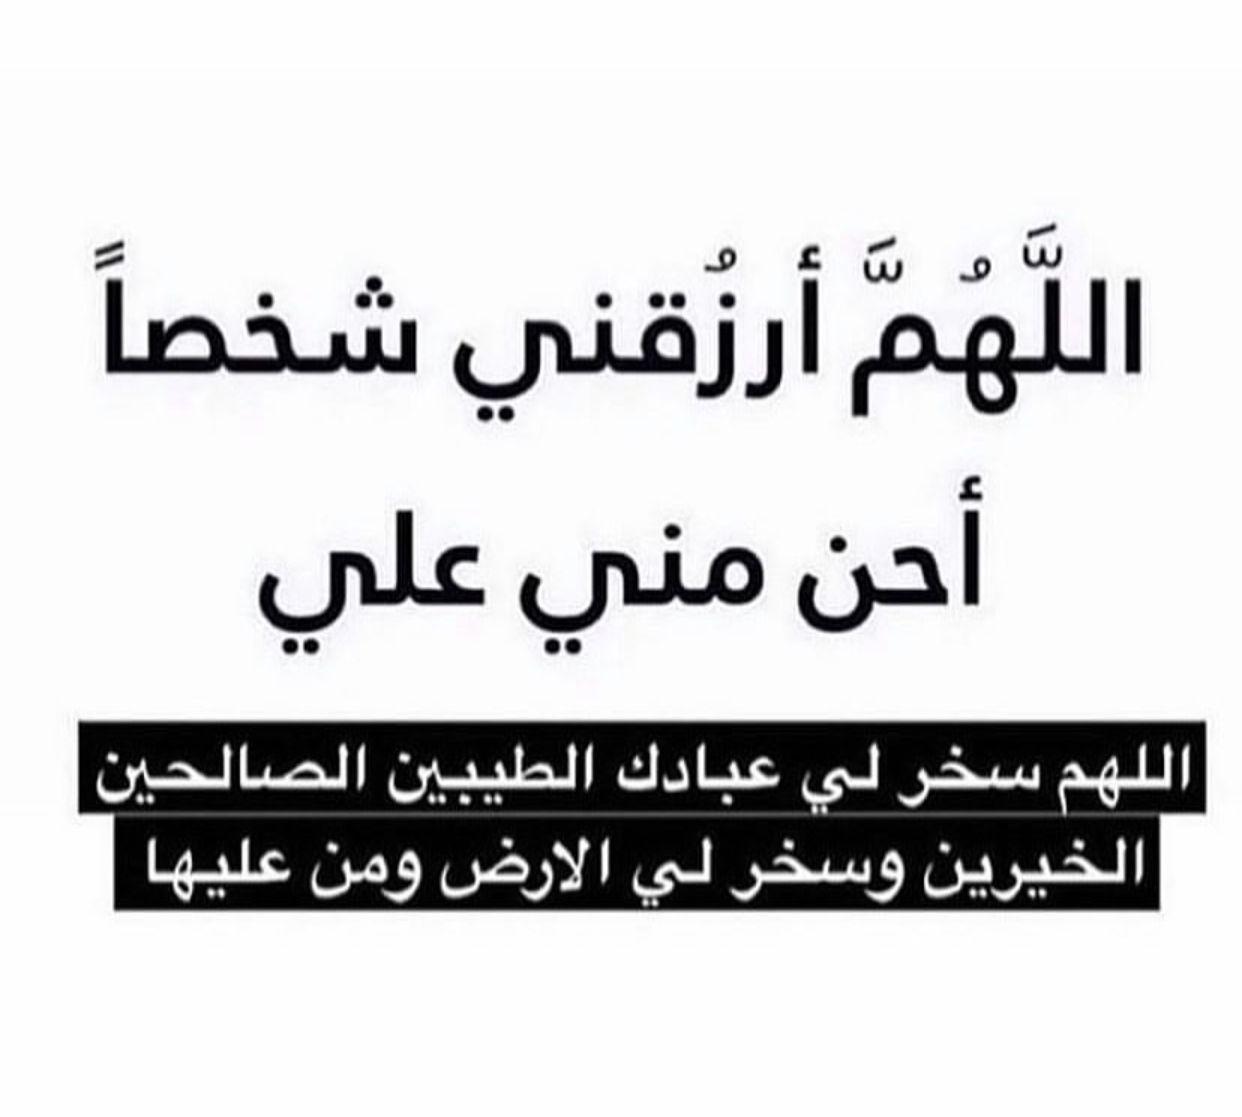 Pin By بنت محمد On يارب Math Arabic Calligraphy Math Equations